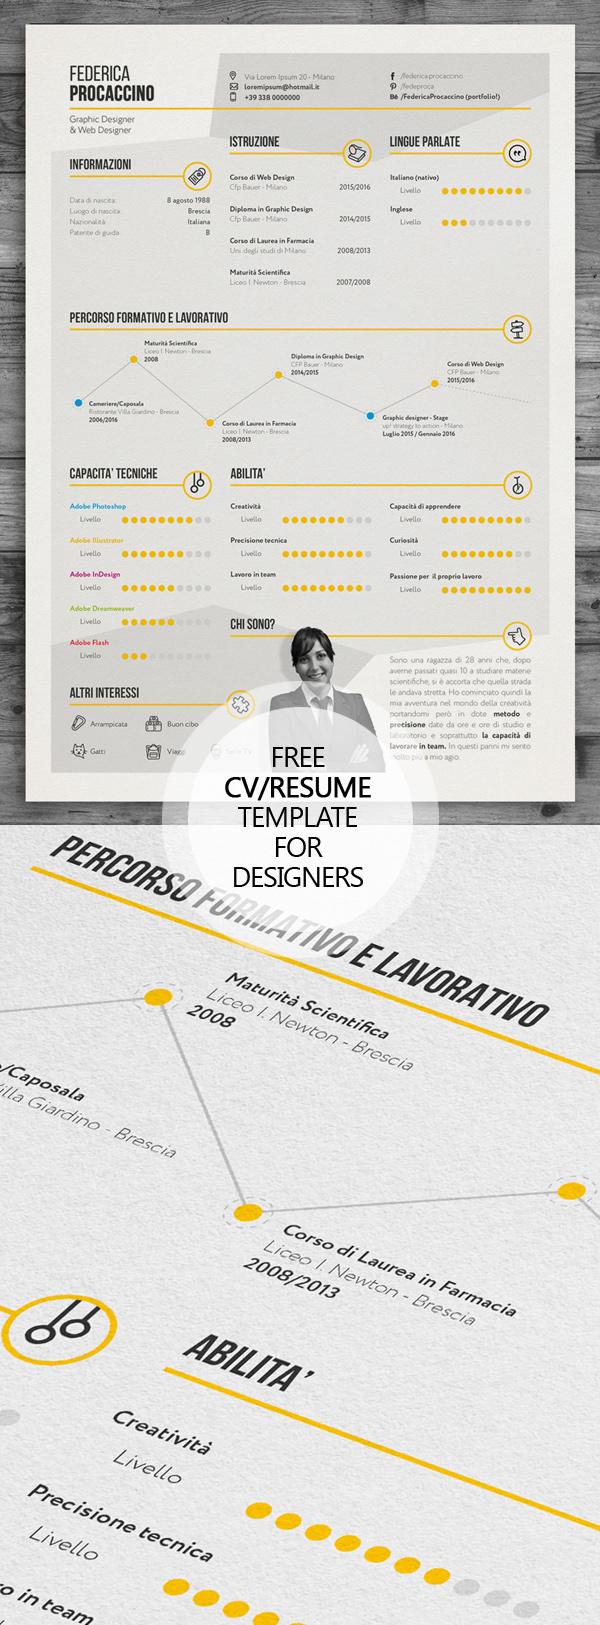 06 Free Creative Freelancer Designer Resume Template (PSD)